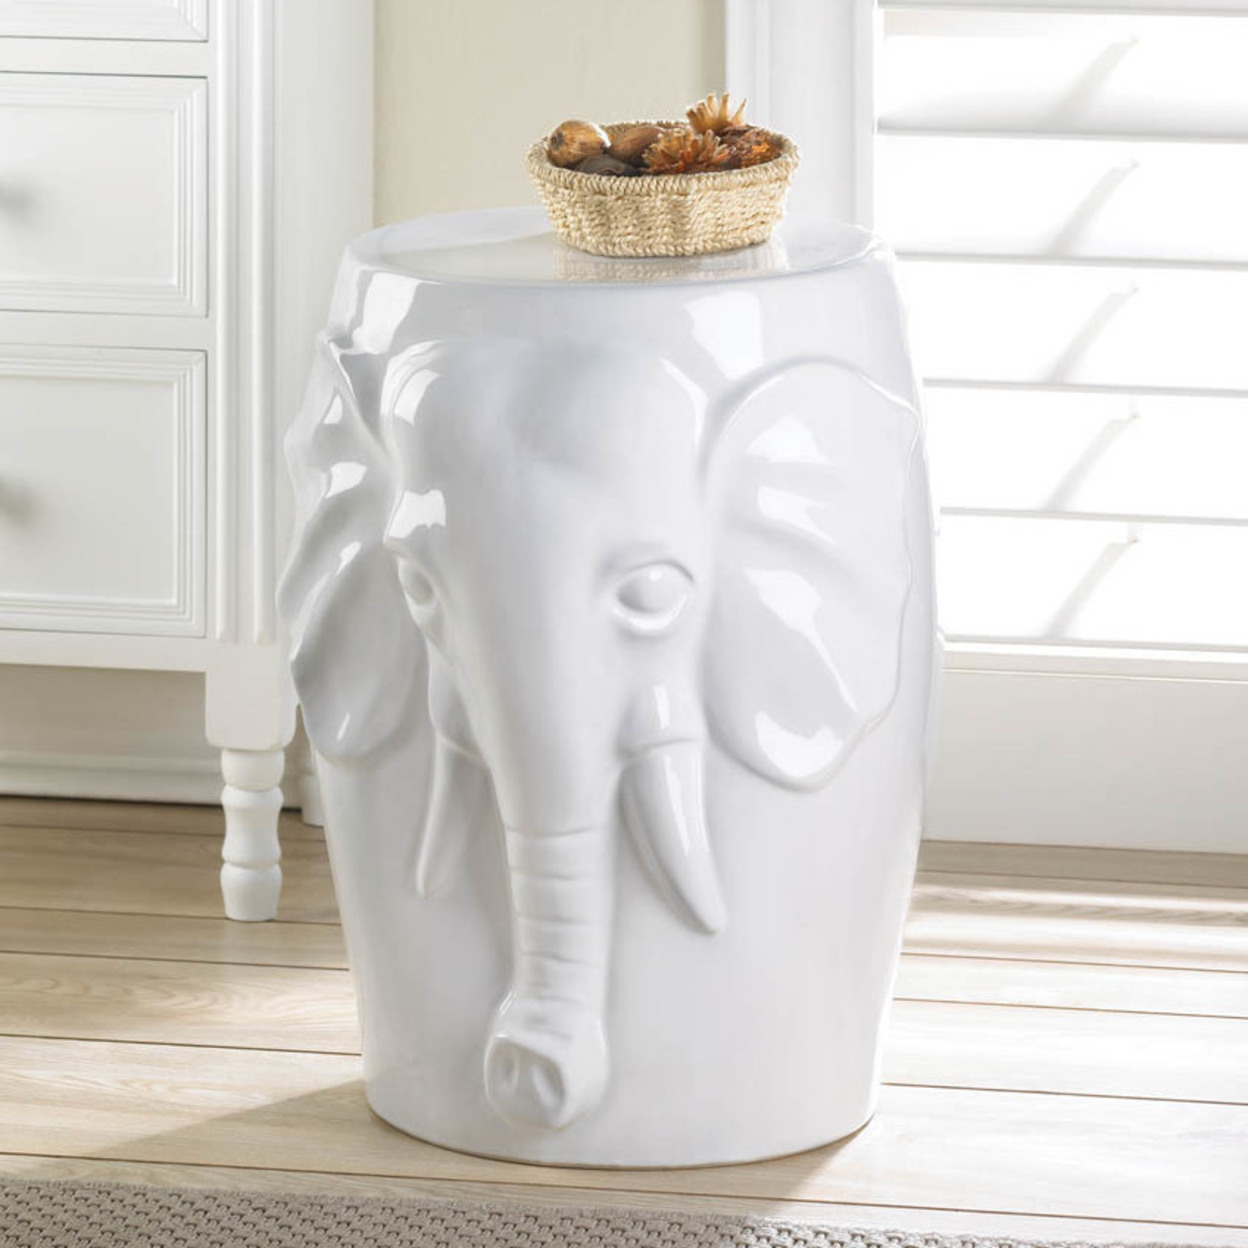 #10016509 Elephant Ceramic Decorative Stool